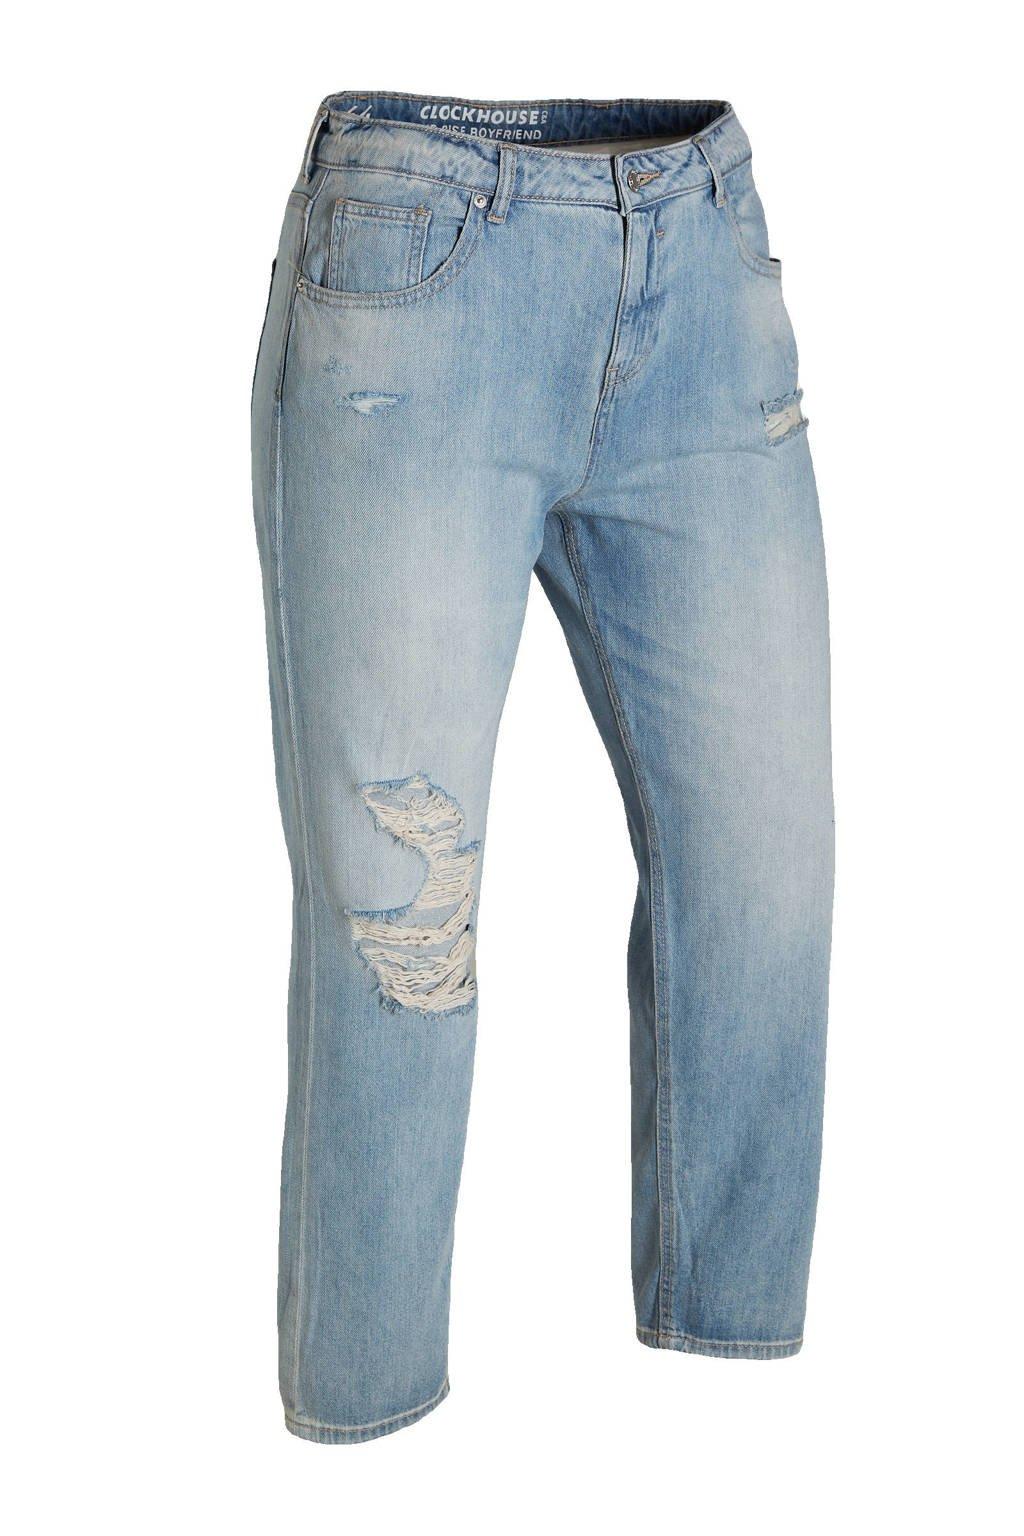 C&A XL Clockhouse cropped straight fit jeans lichtblauw, Lichtblauw